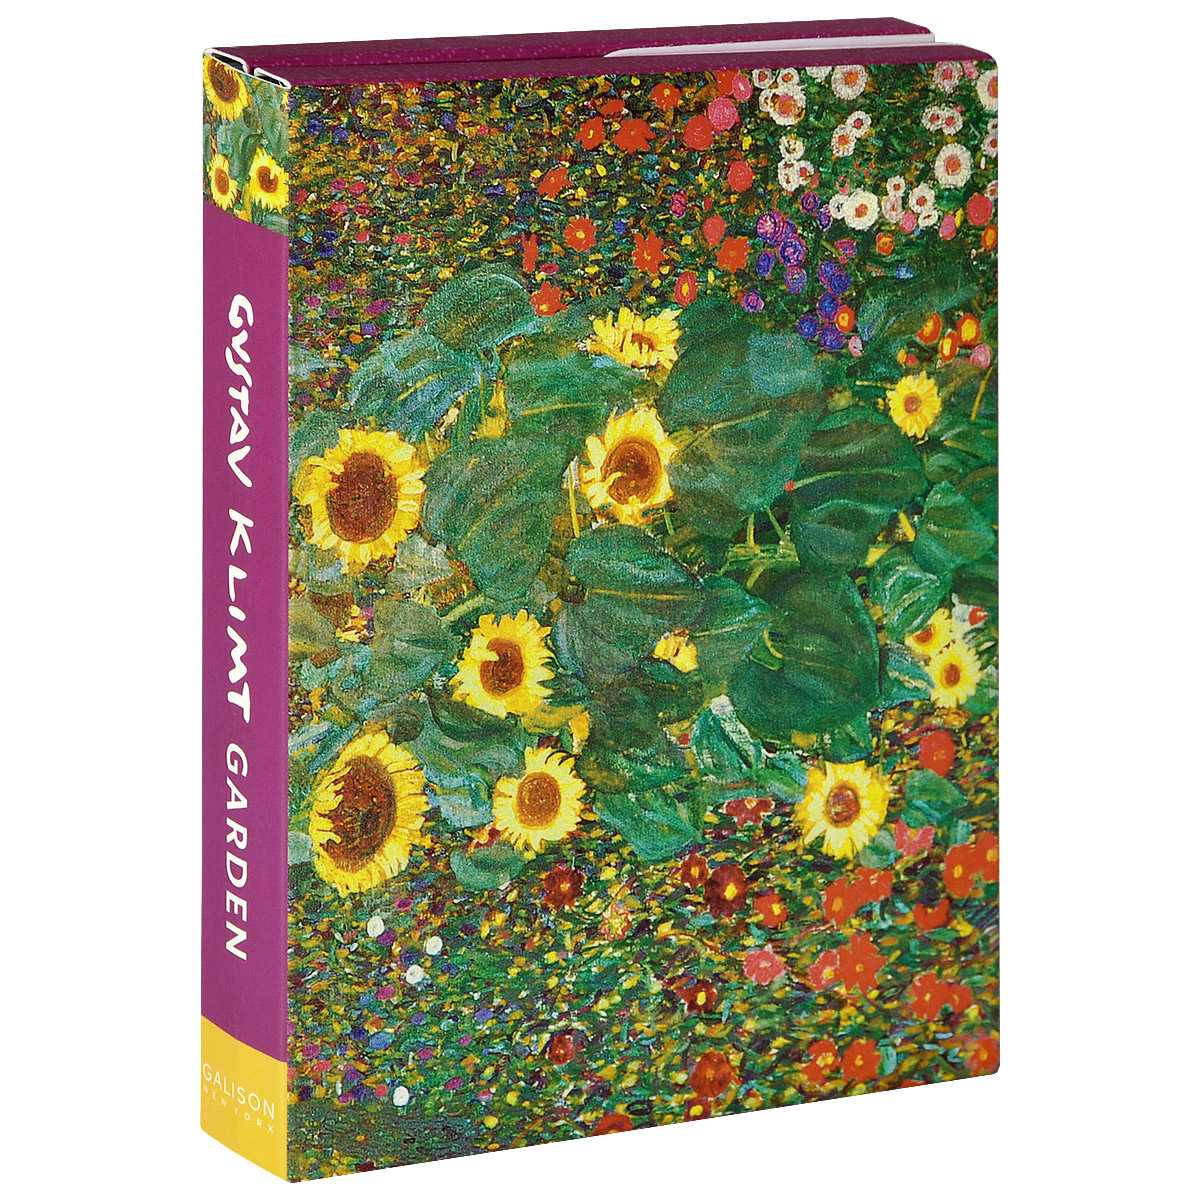 Gustav Klimt Garden: Portfolio Notes home garden 4stroke oil hd 1l 2015 gazp